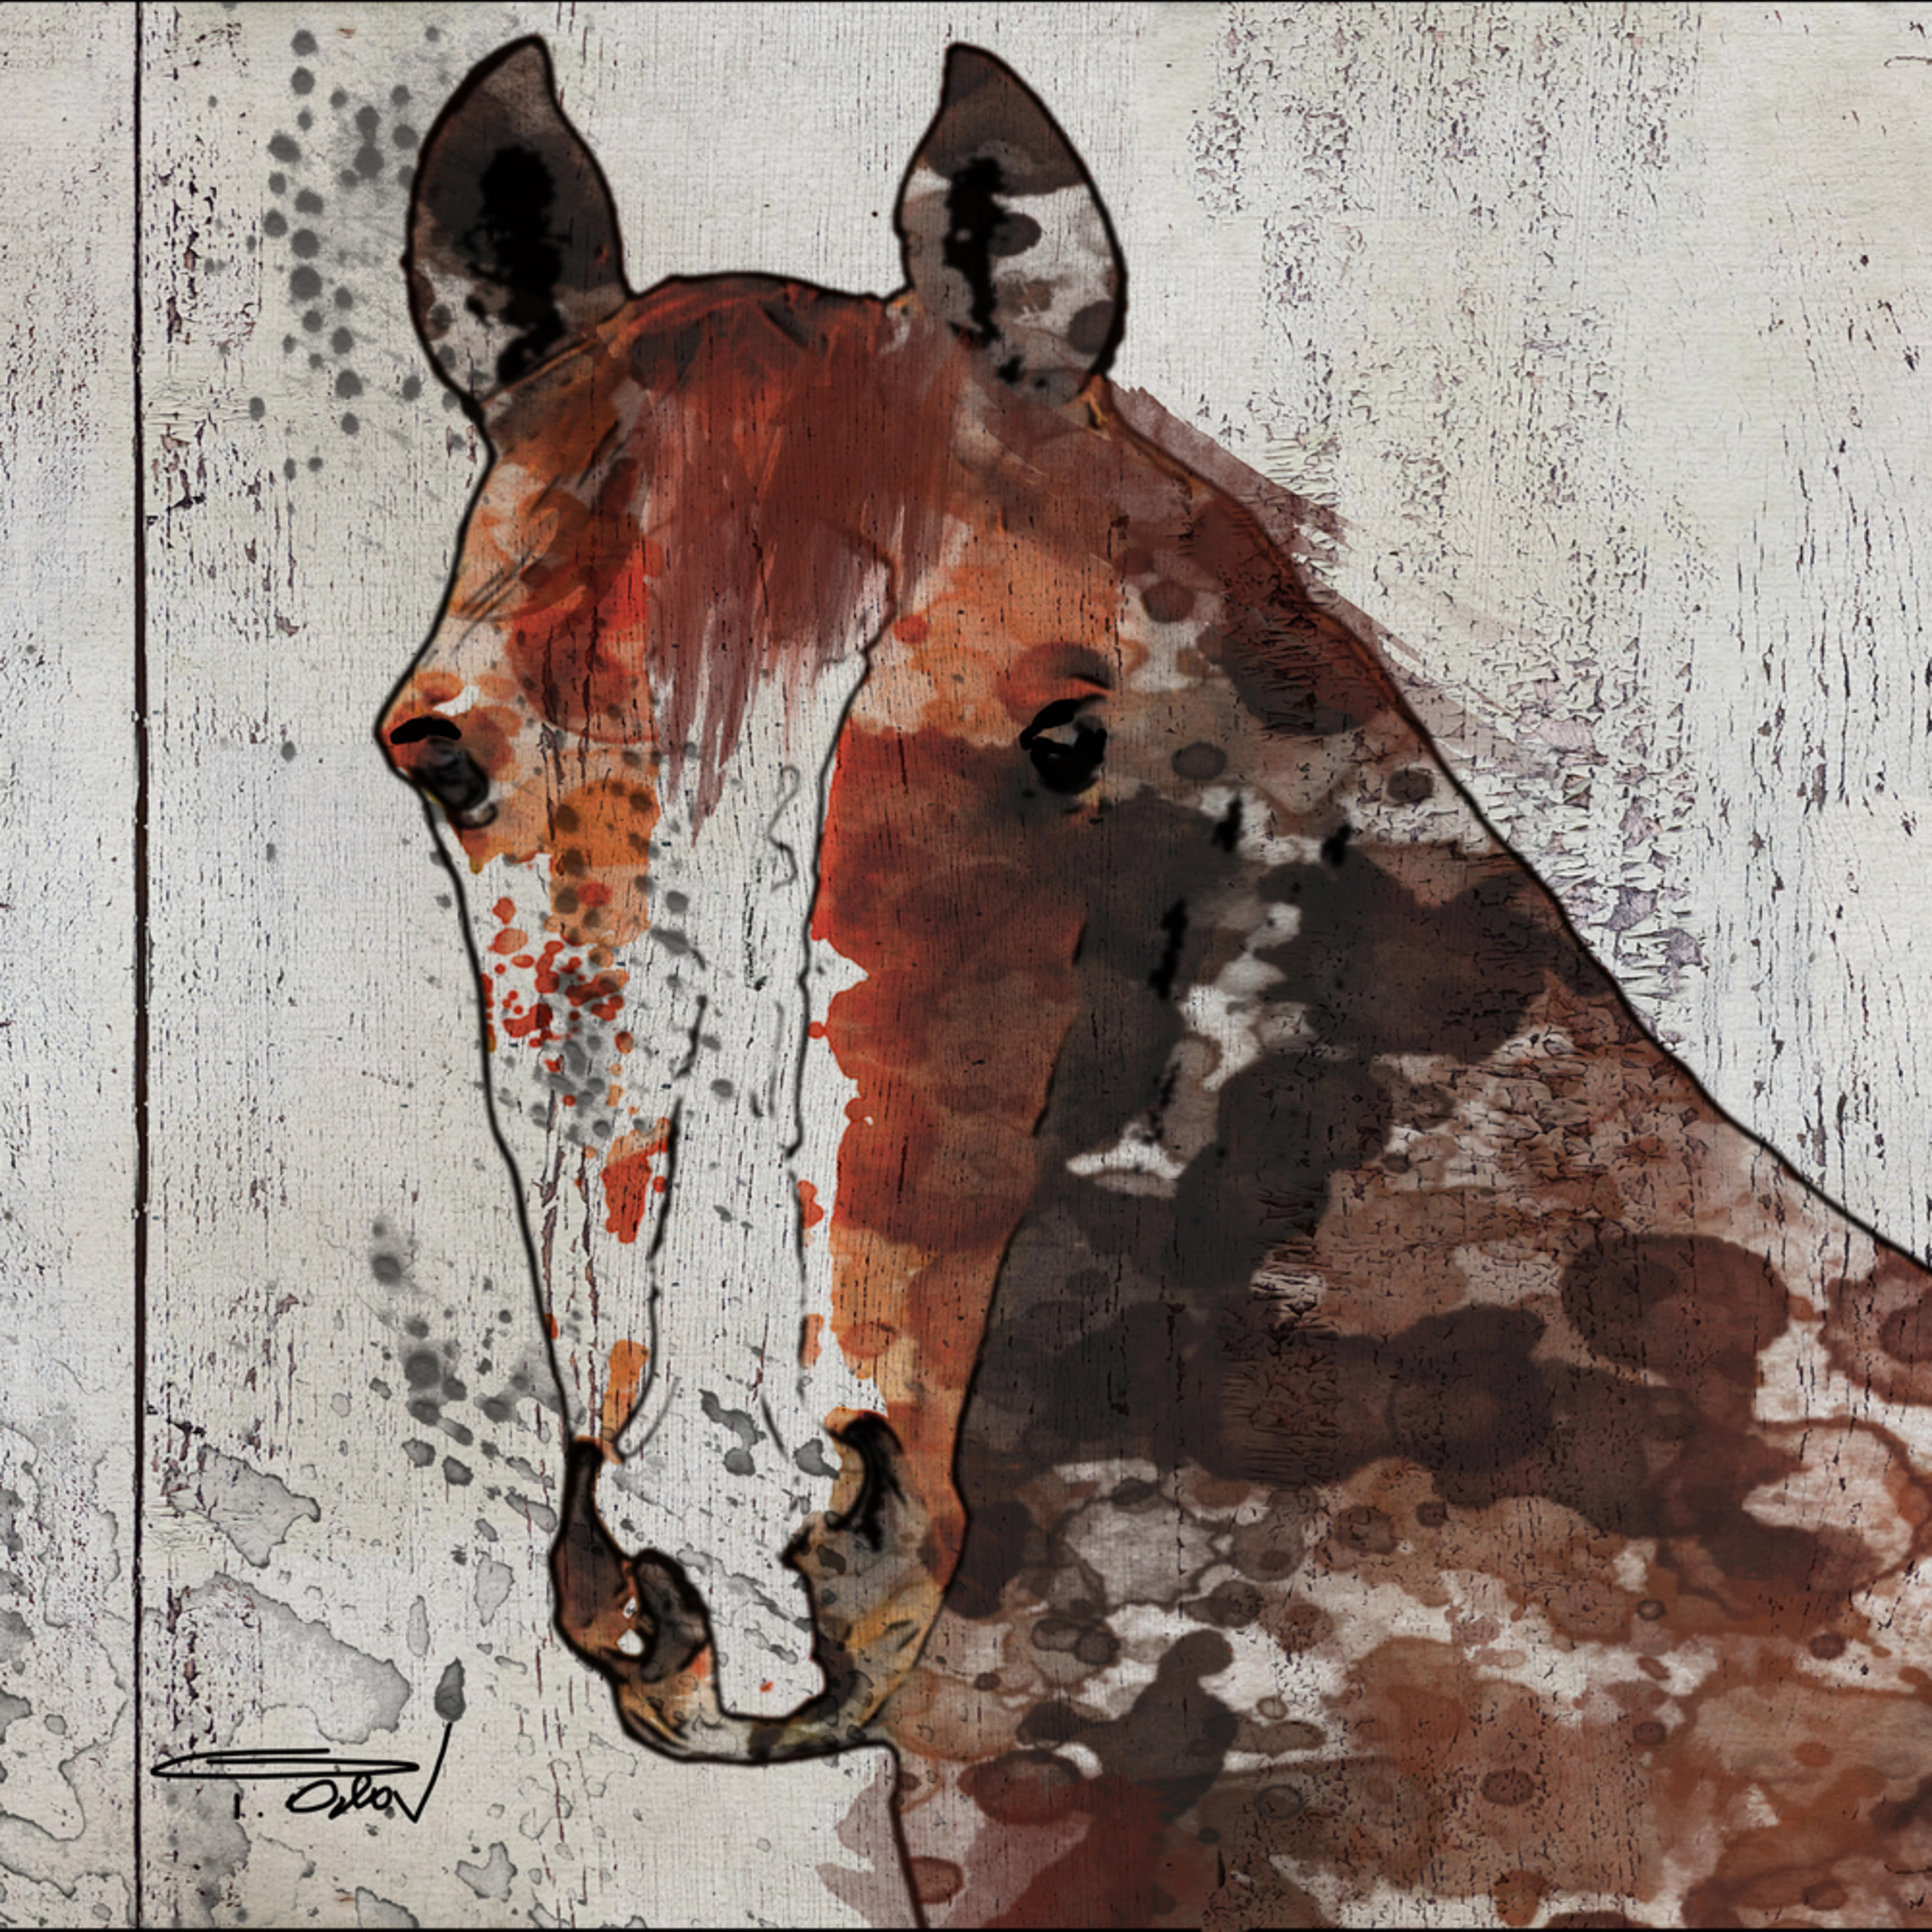 24 x 36 the brown horse 1 nzgzgz